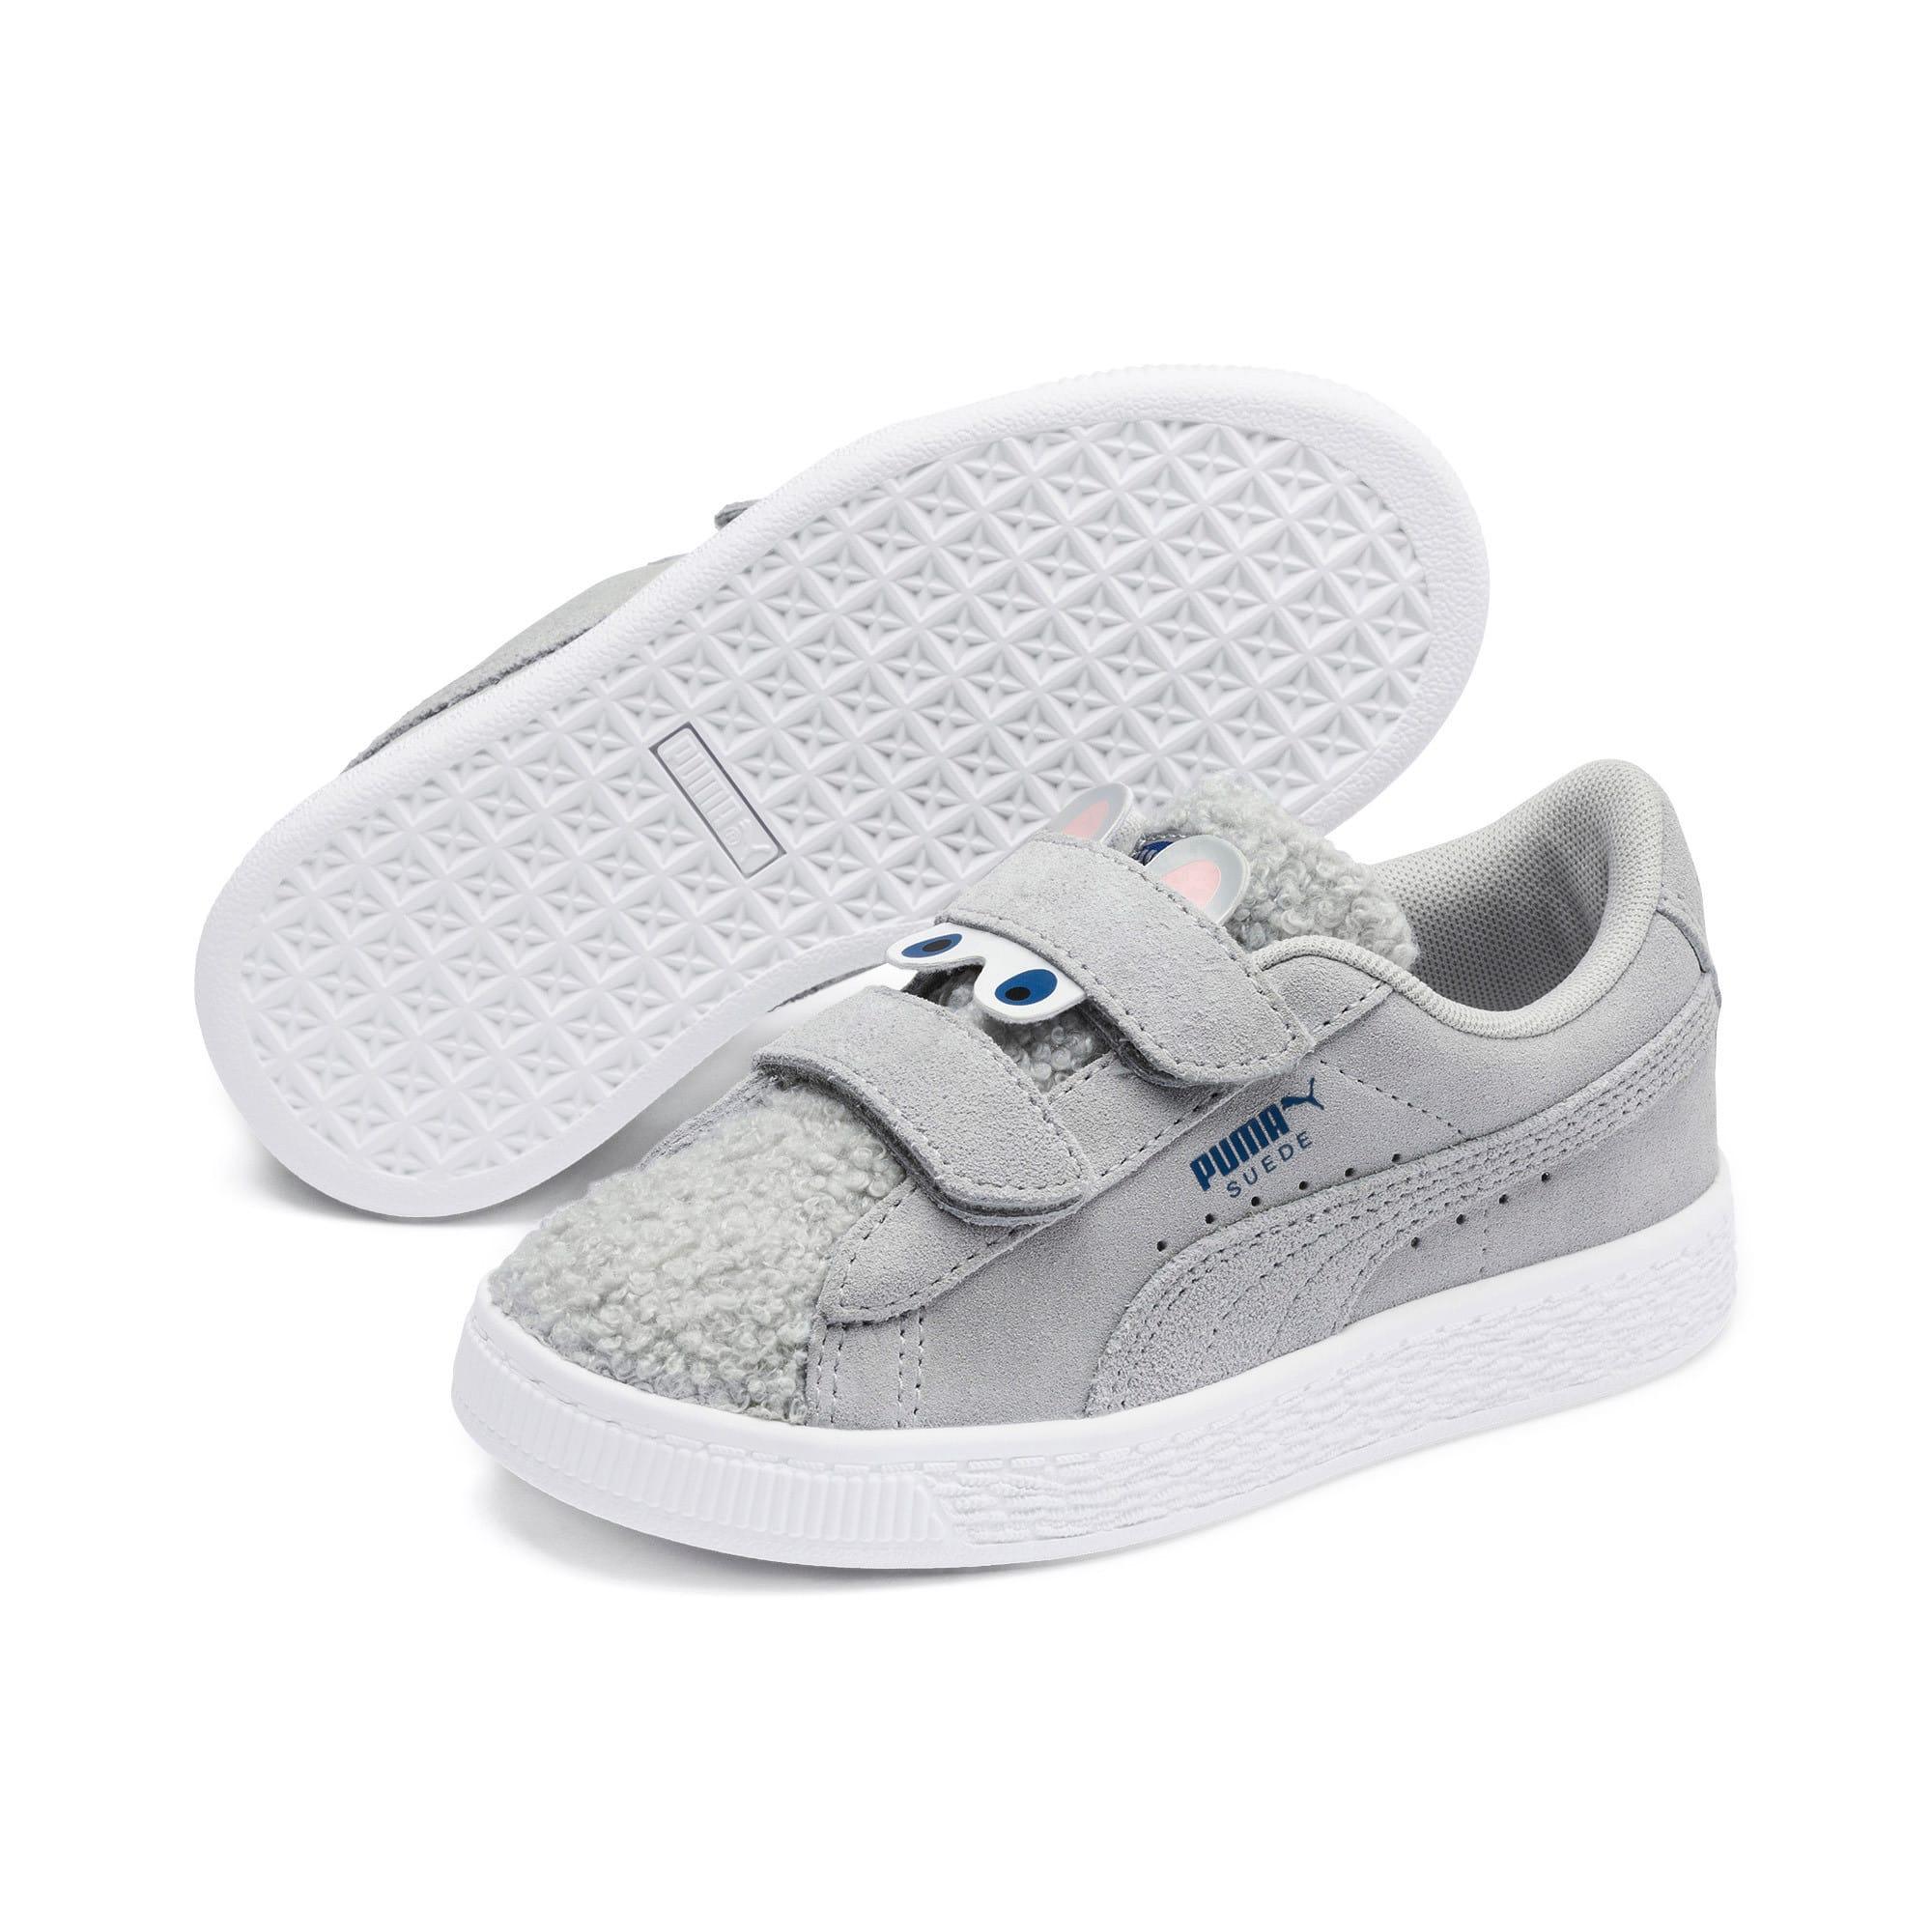 Thumbnail 2 of Suede Winter Monster Little Kids' Shoes, High Rise-Galaxy Blue, medium